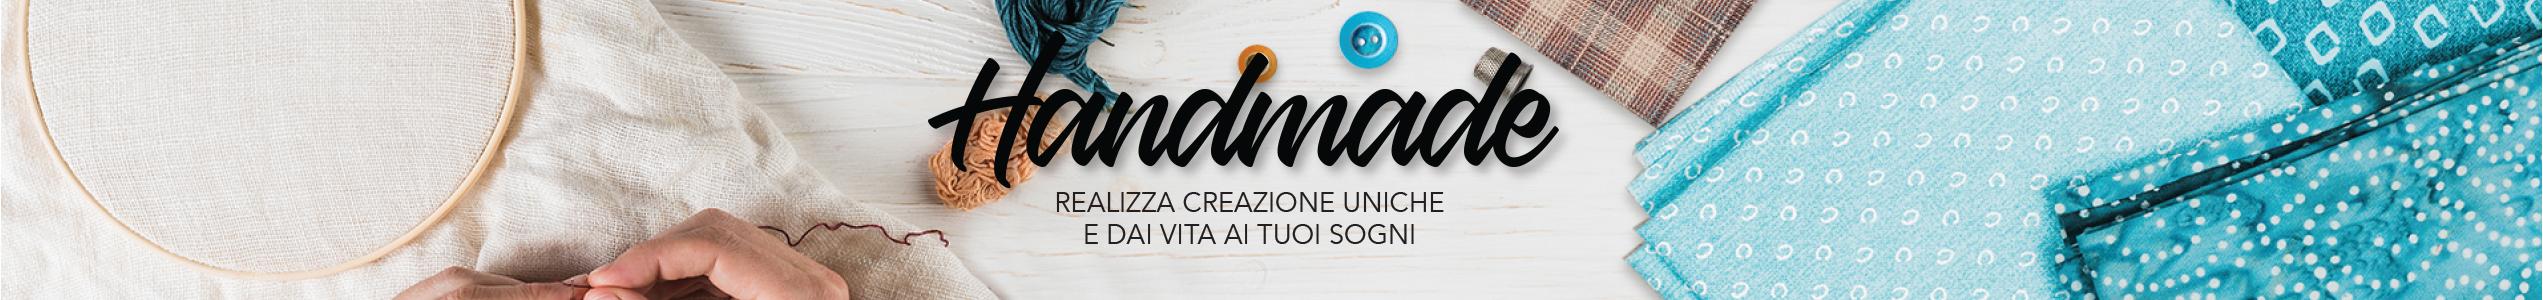 handmade-con-panini-tessuti